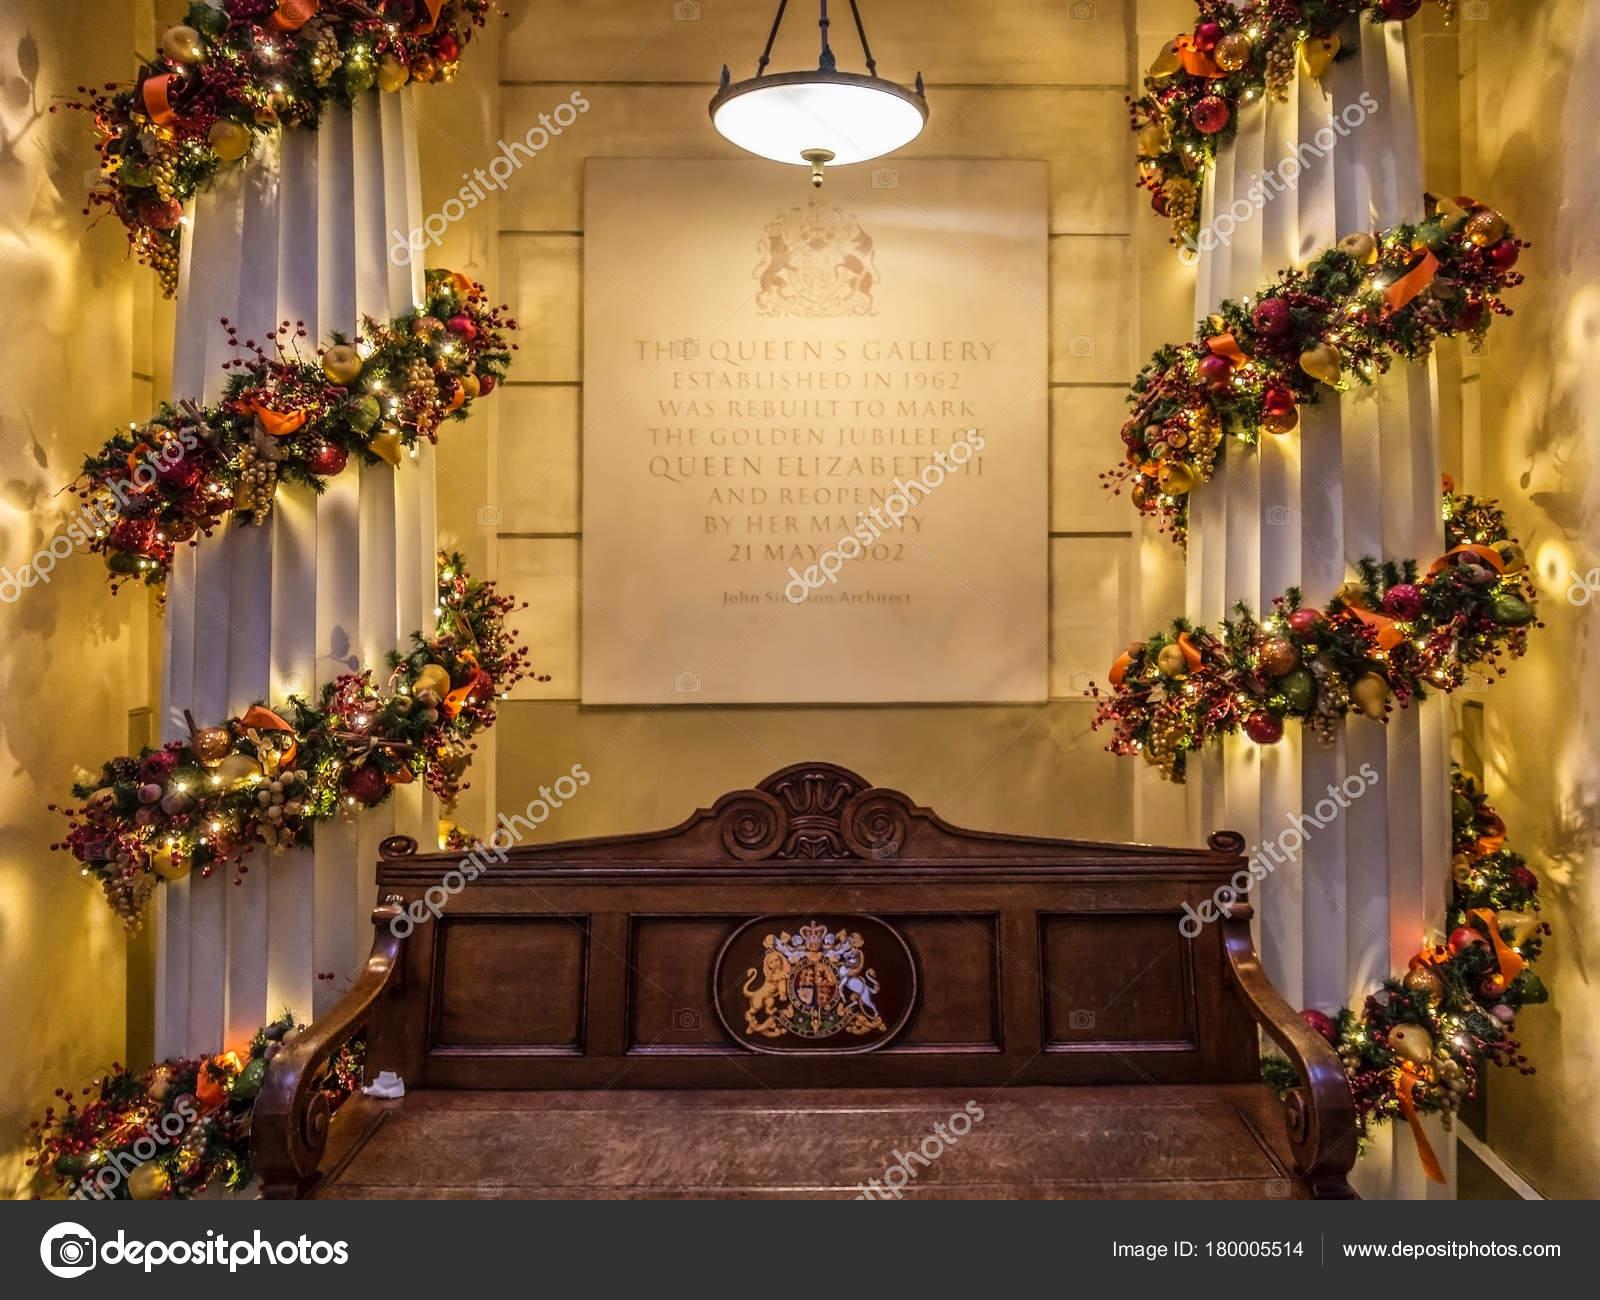 All 39 interno gallery buckingham palace londra della - Buckingham palace interno ...